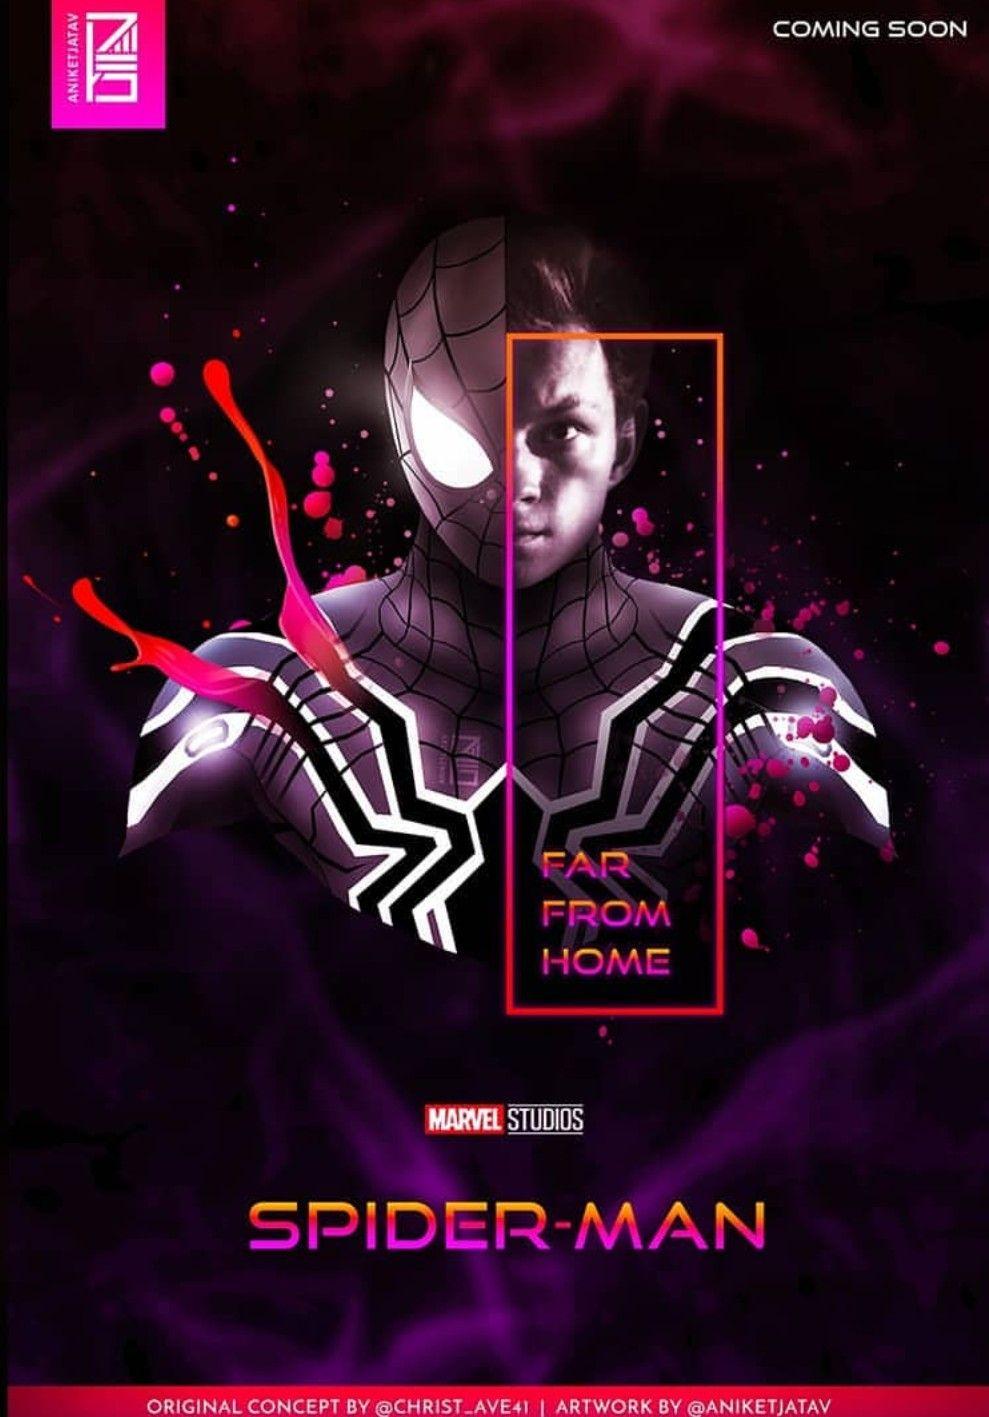 spider-man, far from home | spidy | spiderman, marvel, spider